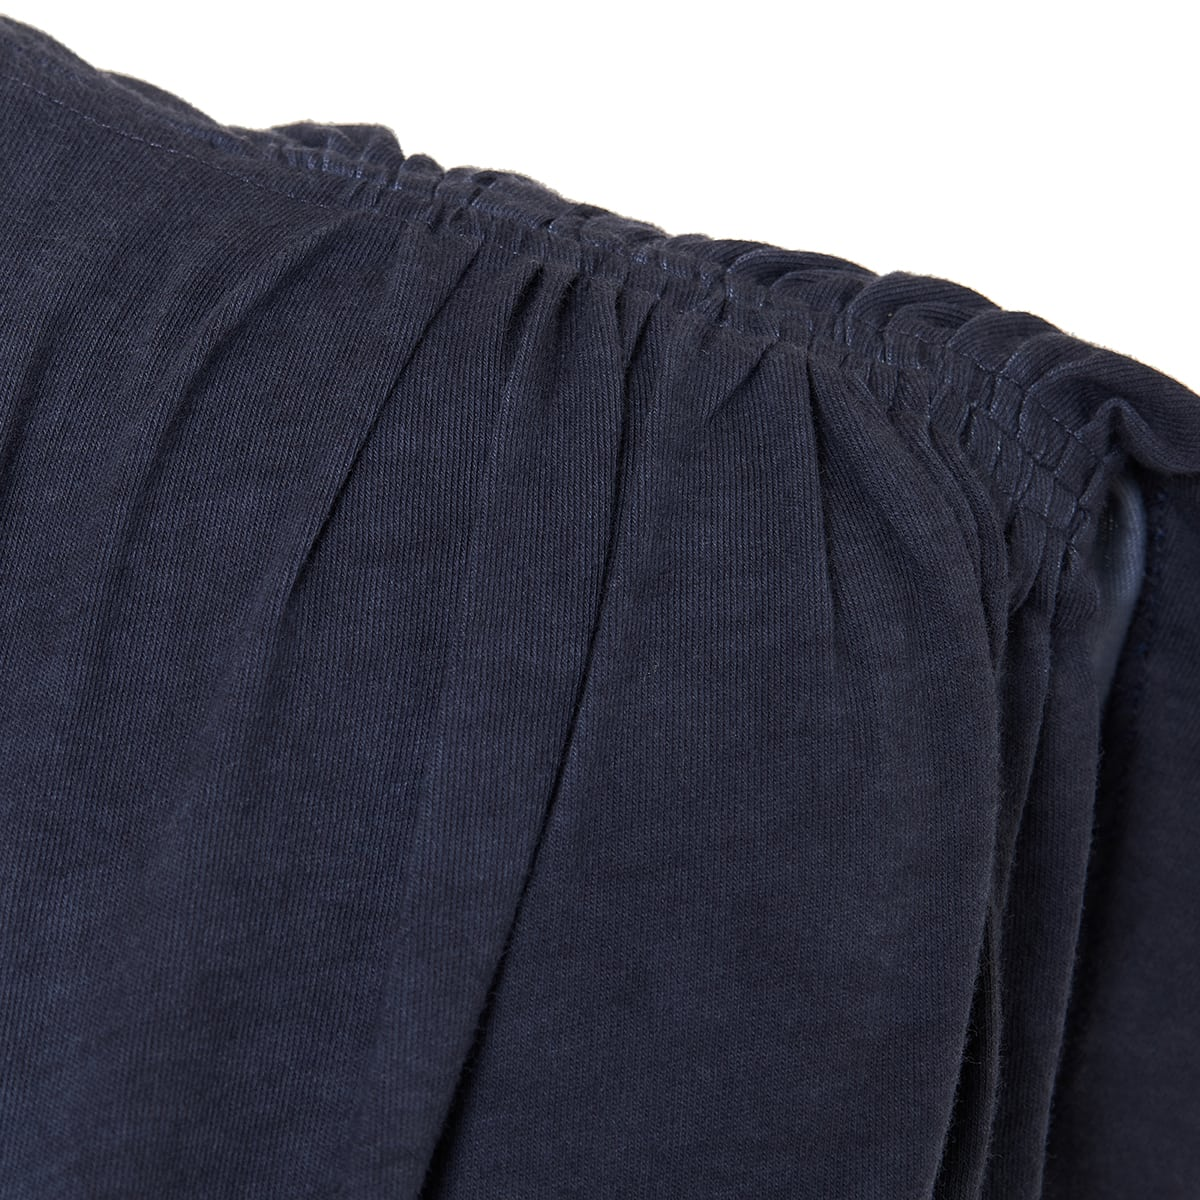 Sitian ruched cotton mini dress